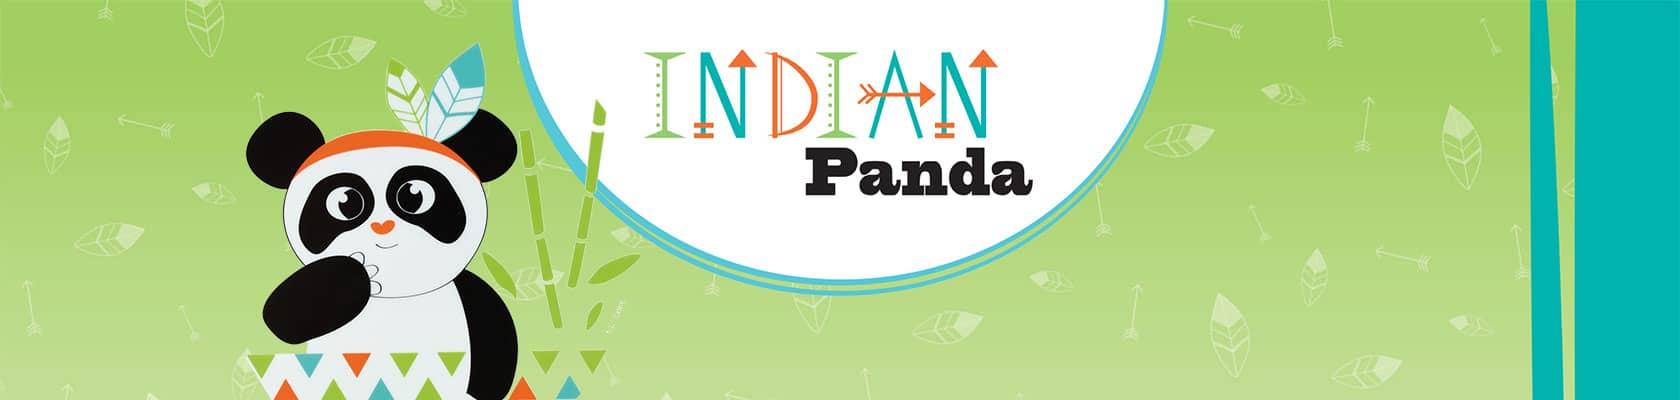 Indian Panda